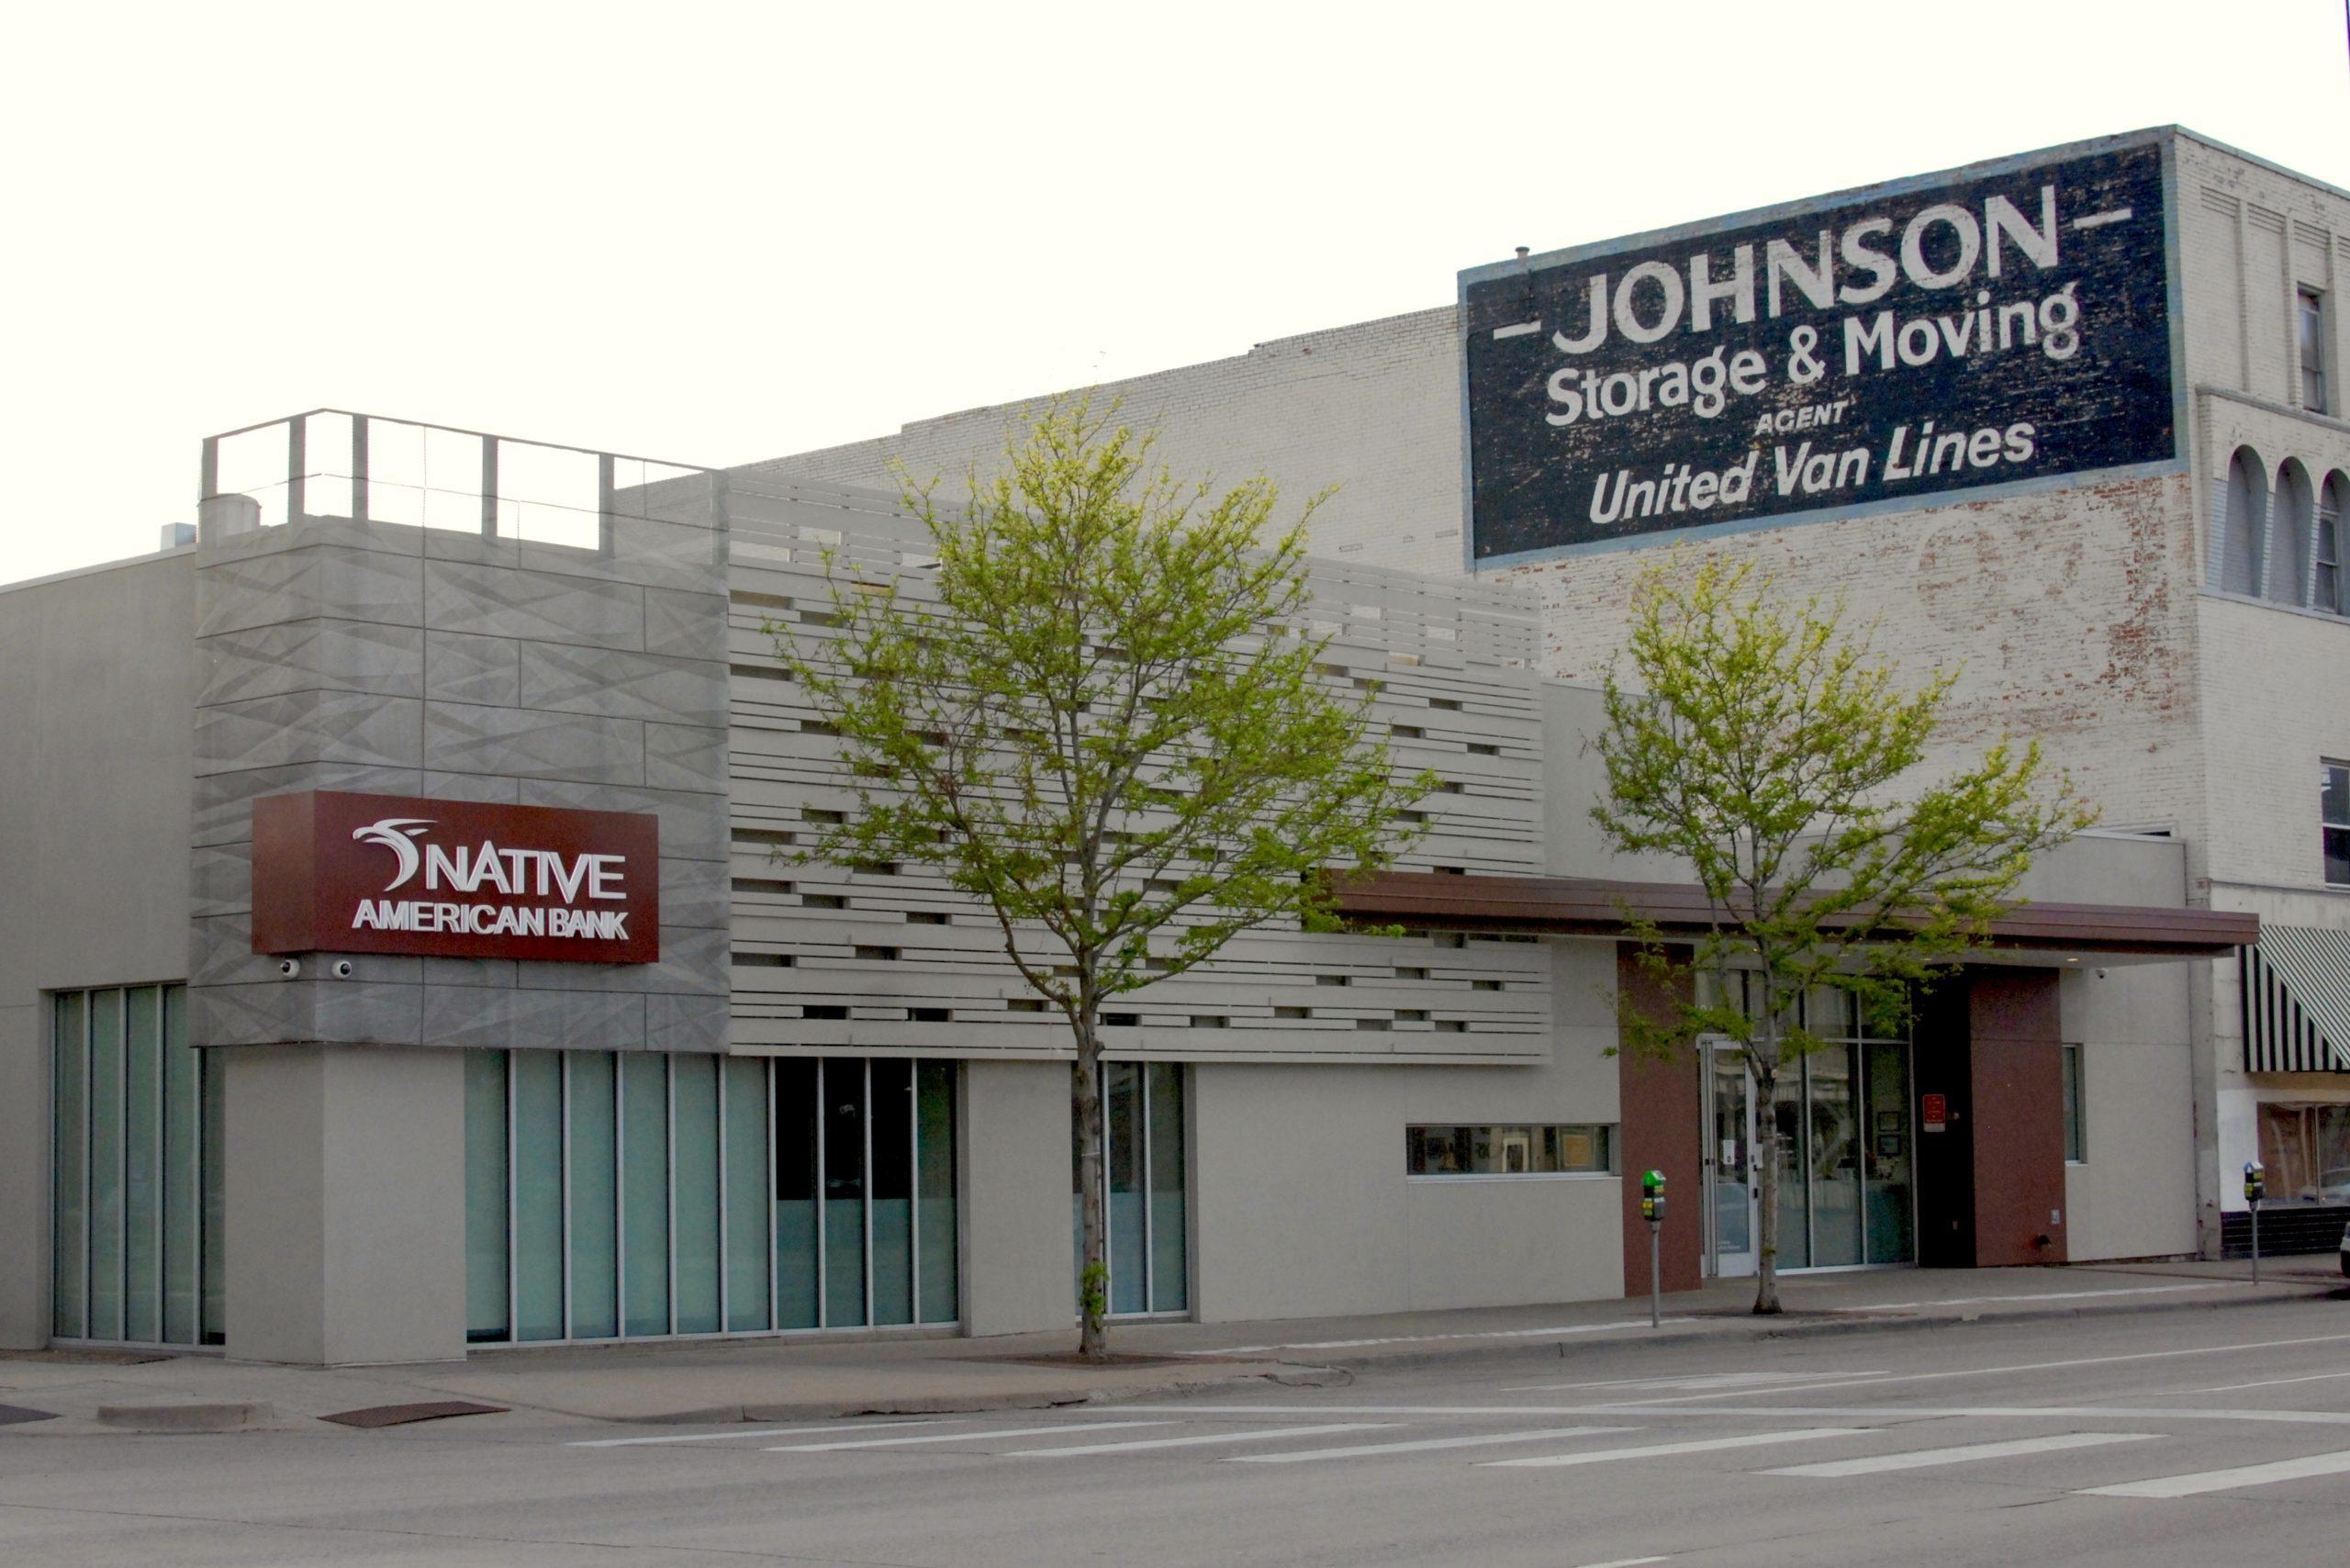 Denver-based Native American Bank on South Broadway.